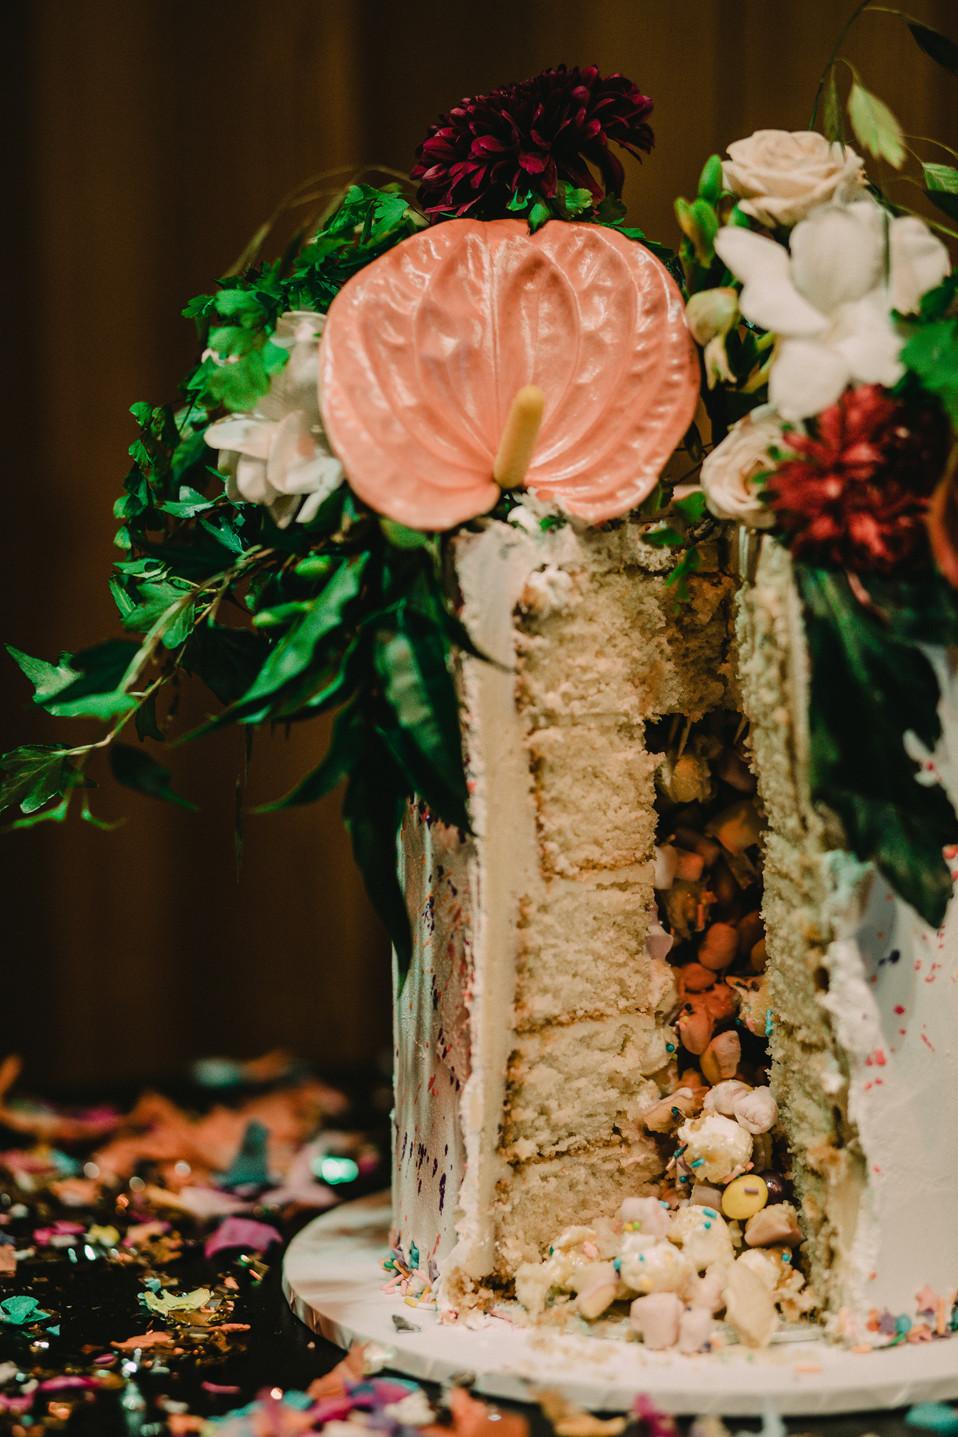 Vegan pinata wedding cake by Tiny Sarah's Cakes. Image Chloe Mary Photo.